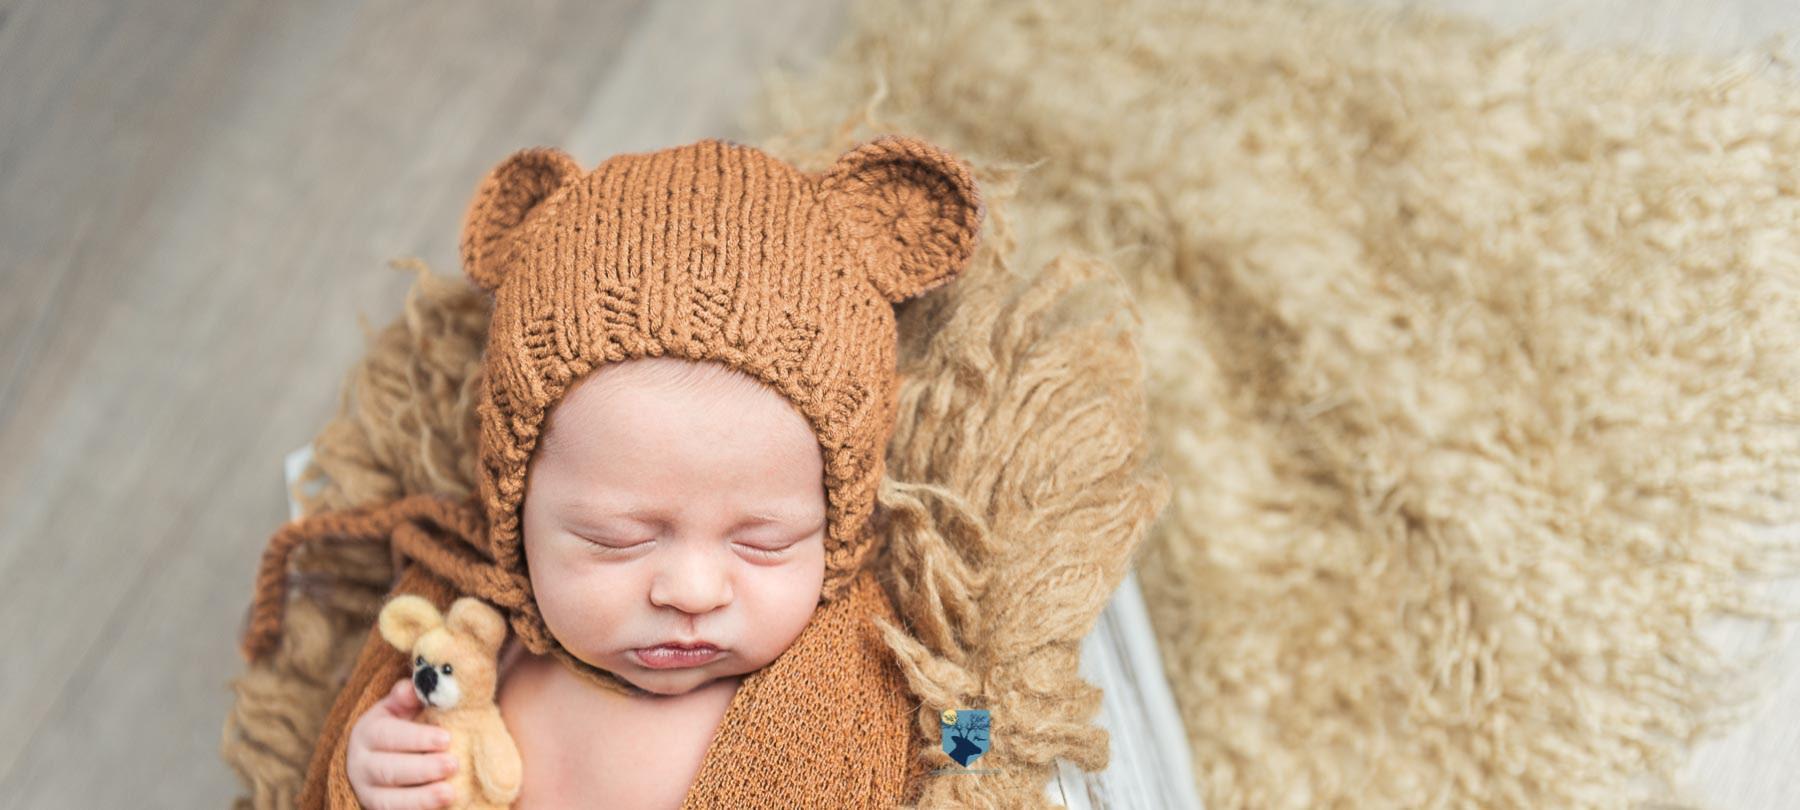 fotografia,girona,figueres,emporda,monica quintana,bebes,niños,familia,retrato,recien,nacido,nado,newborn,olot